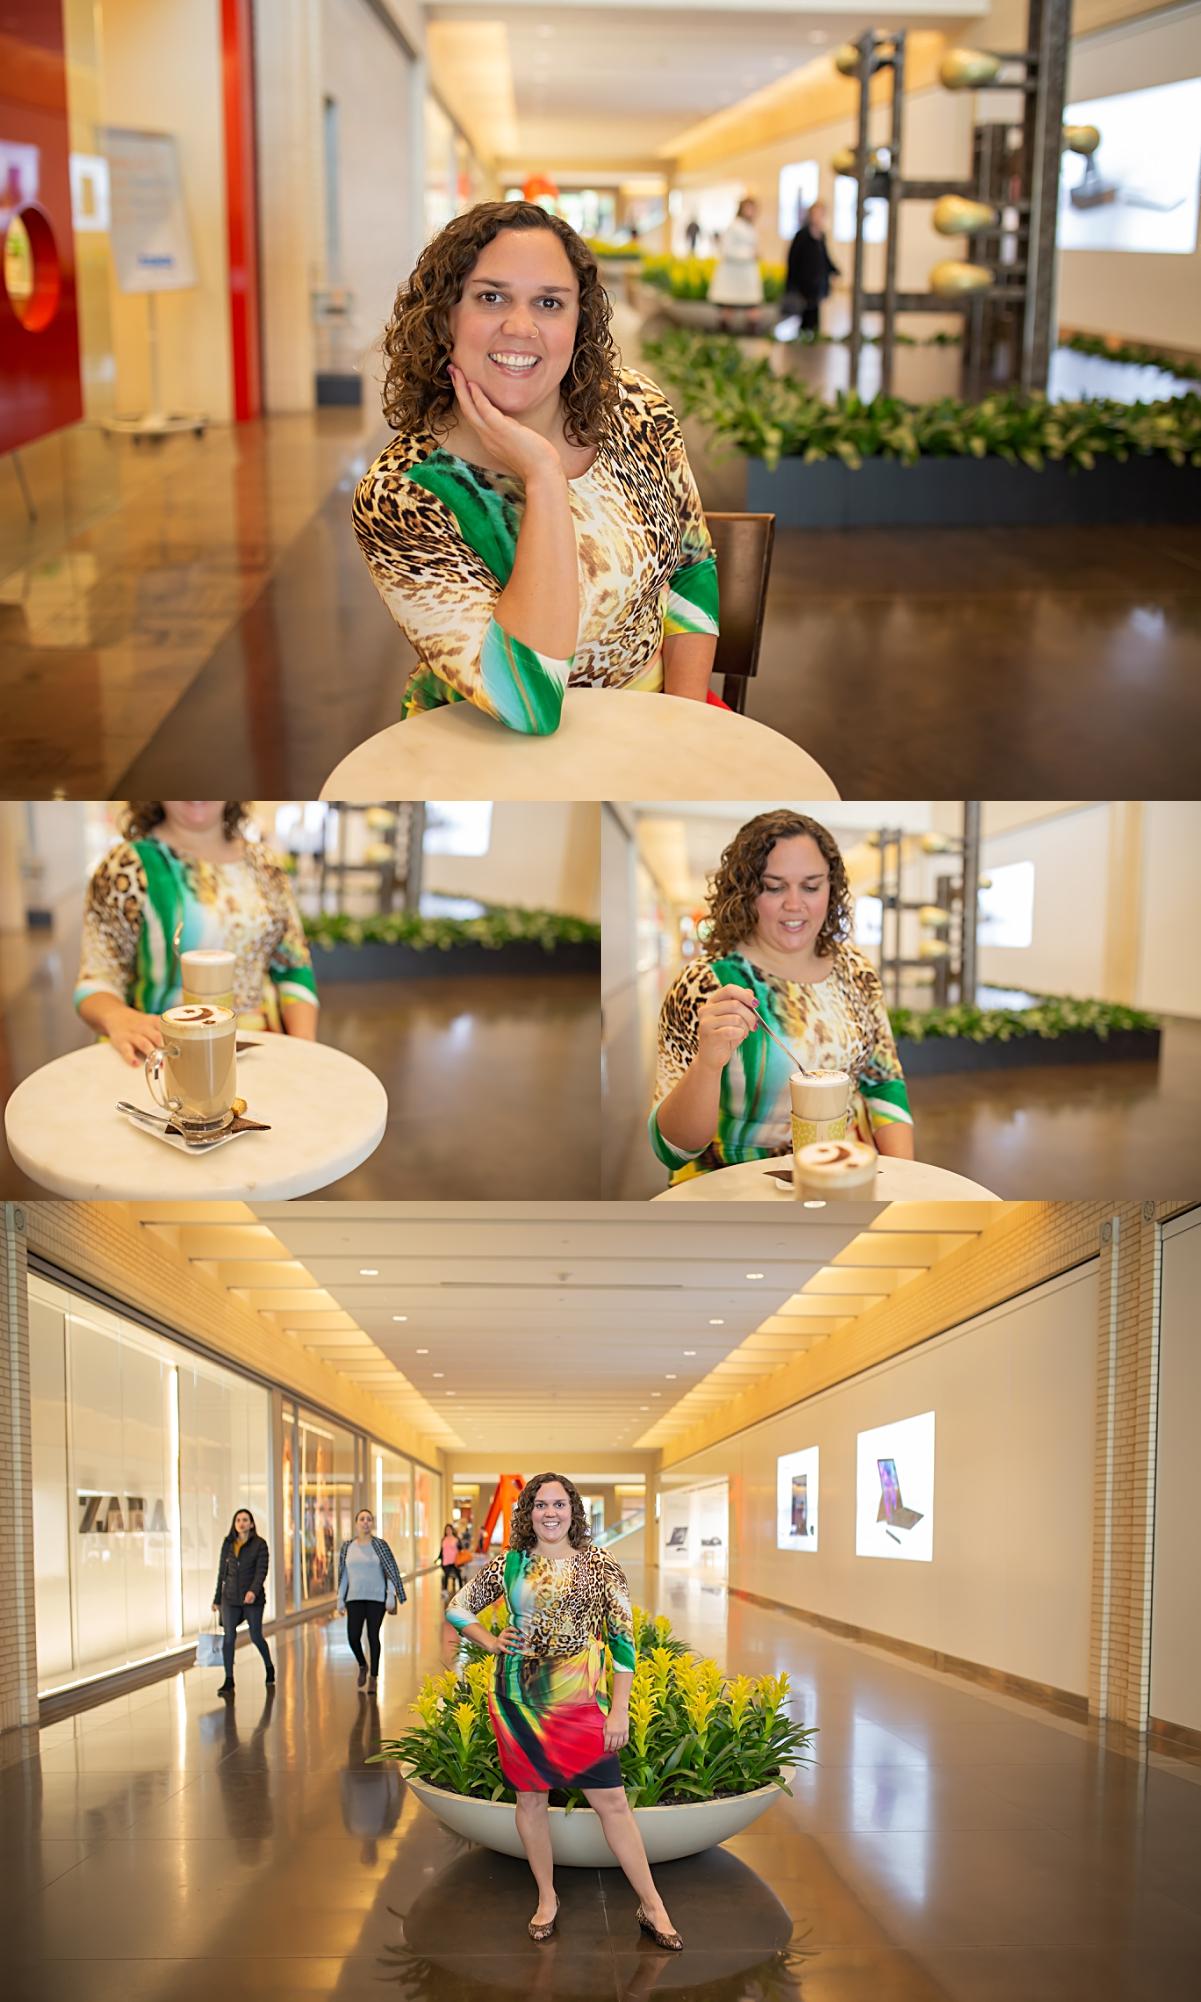 dallas newborn photographer interviews north dallas doula associates lauren bullington about placenta encapsulation over coffee at northpark mall